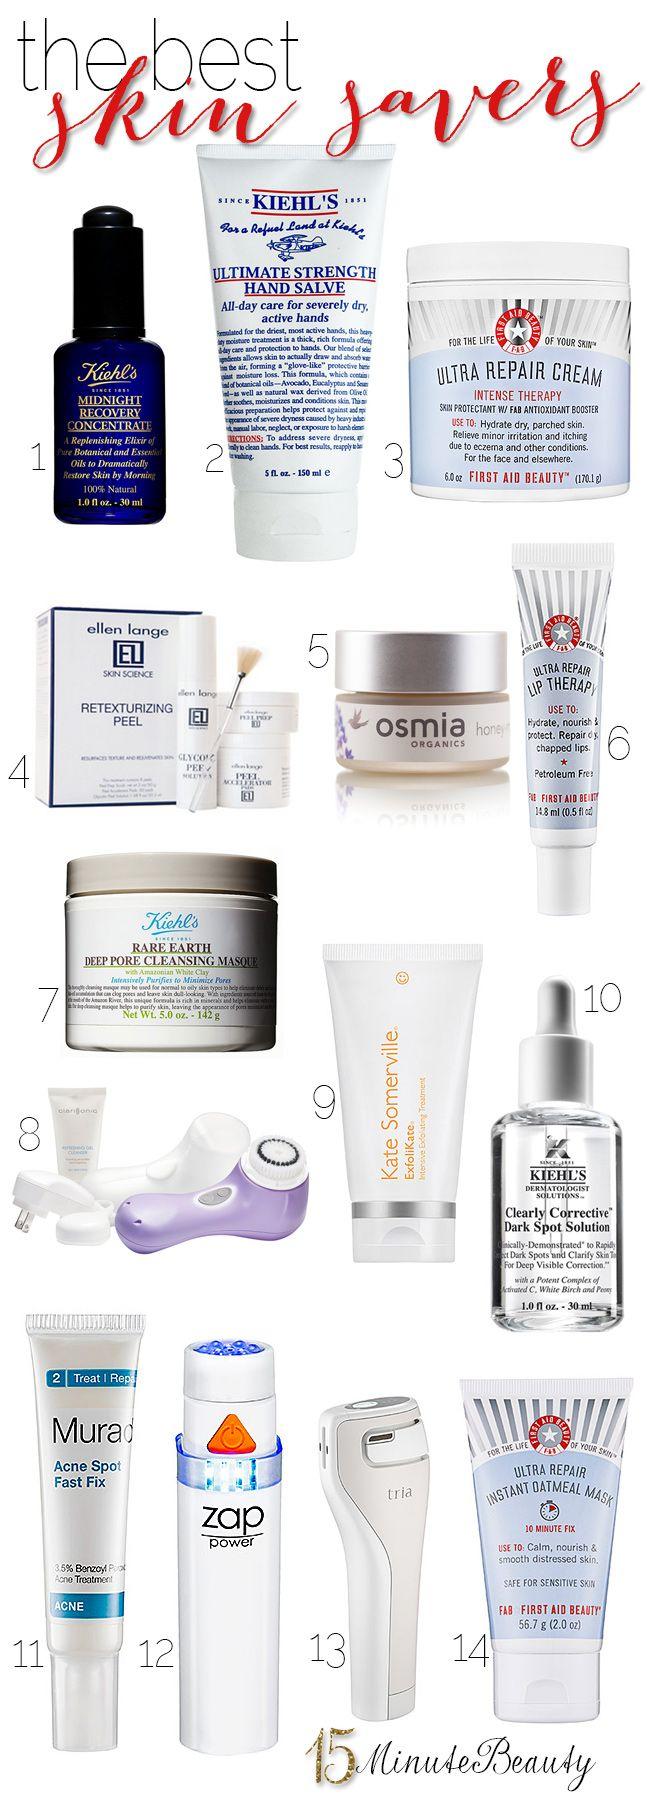 Makeup Wars: My Favorite Skin Savers via @15minbeauty